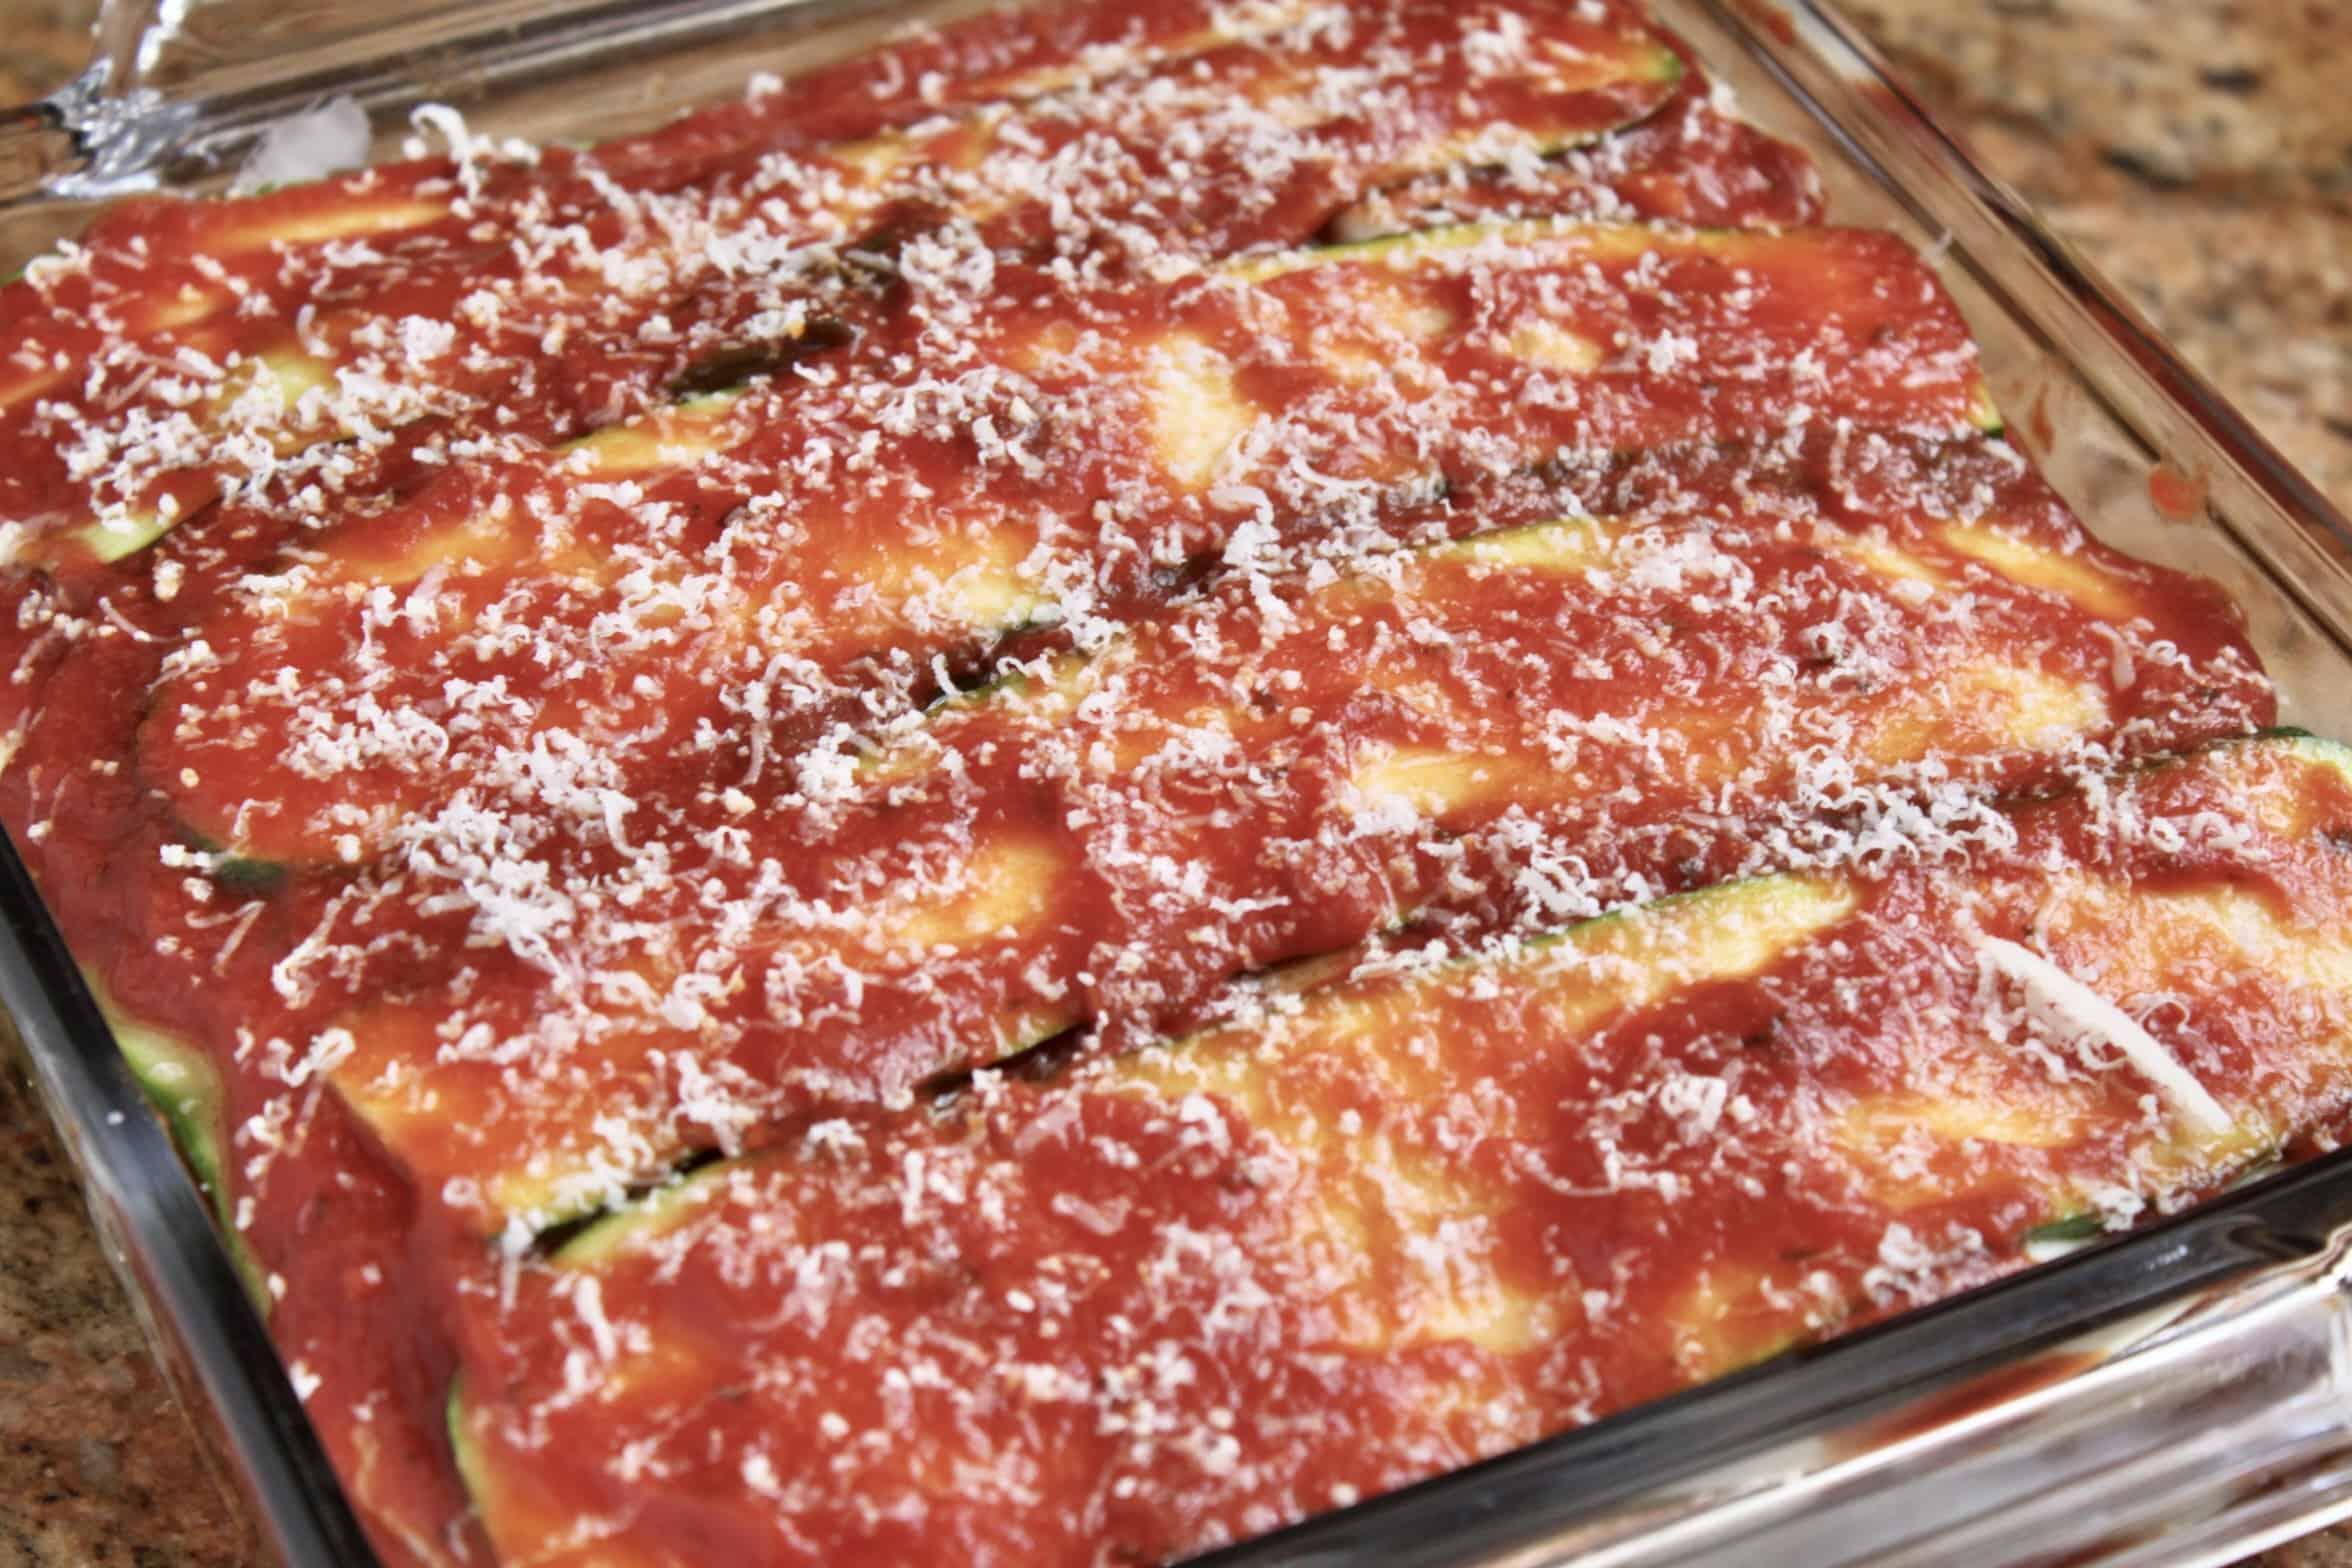 zucchini lasagna ready to bake